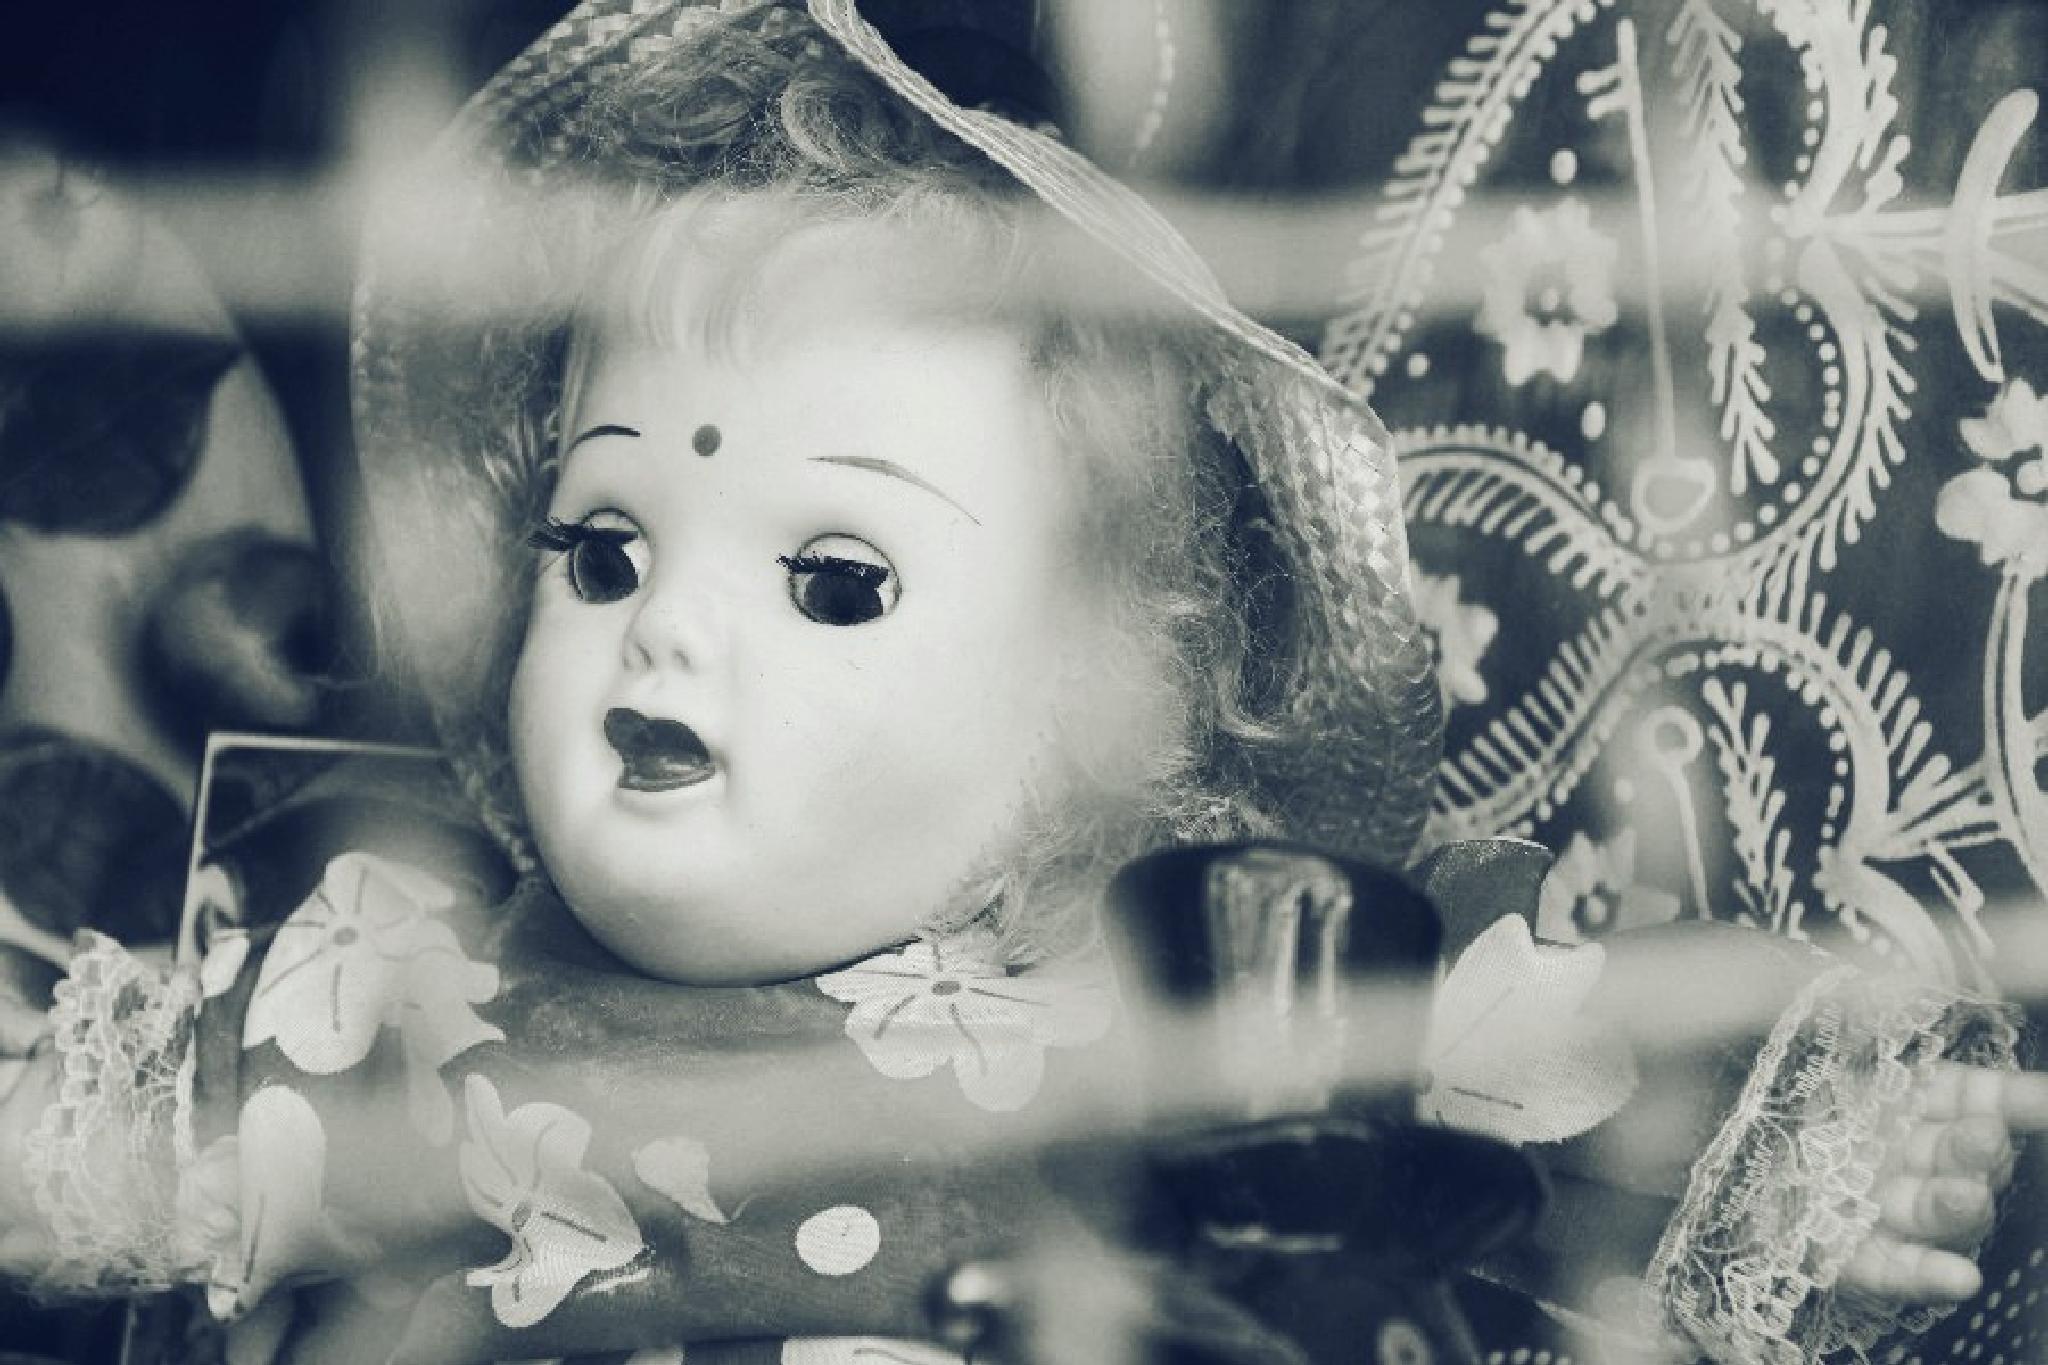 Doll in prison by Helena Lagartinho